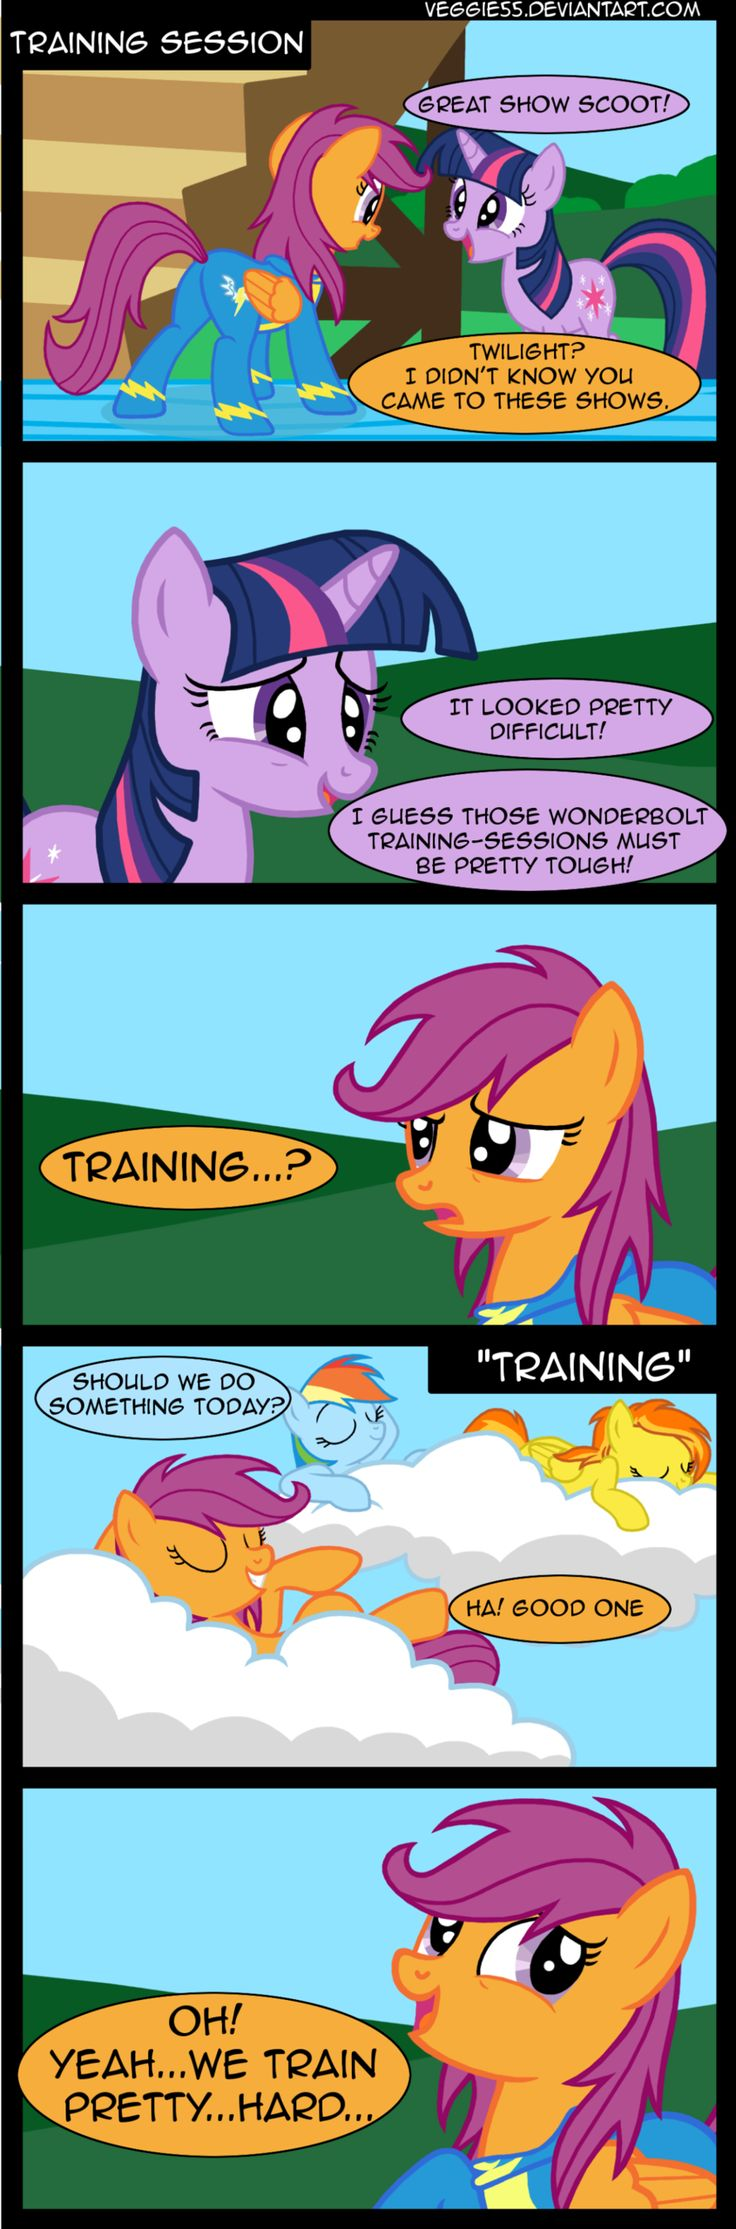 My-Little-Pony-Comics-my-little-pony-friendship-is-magic-27384976-845-2560.png 845×2,560 pixels